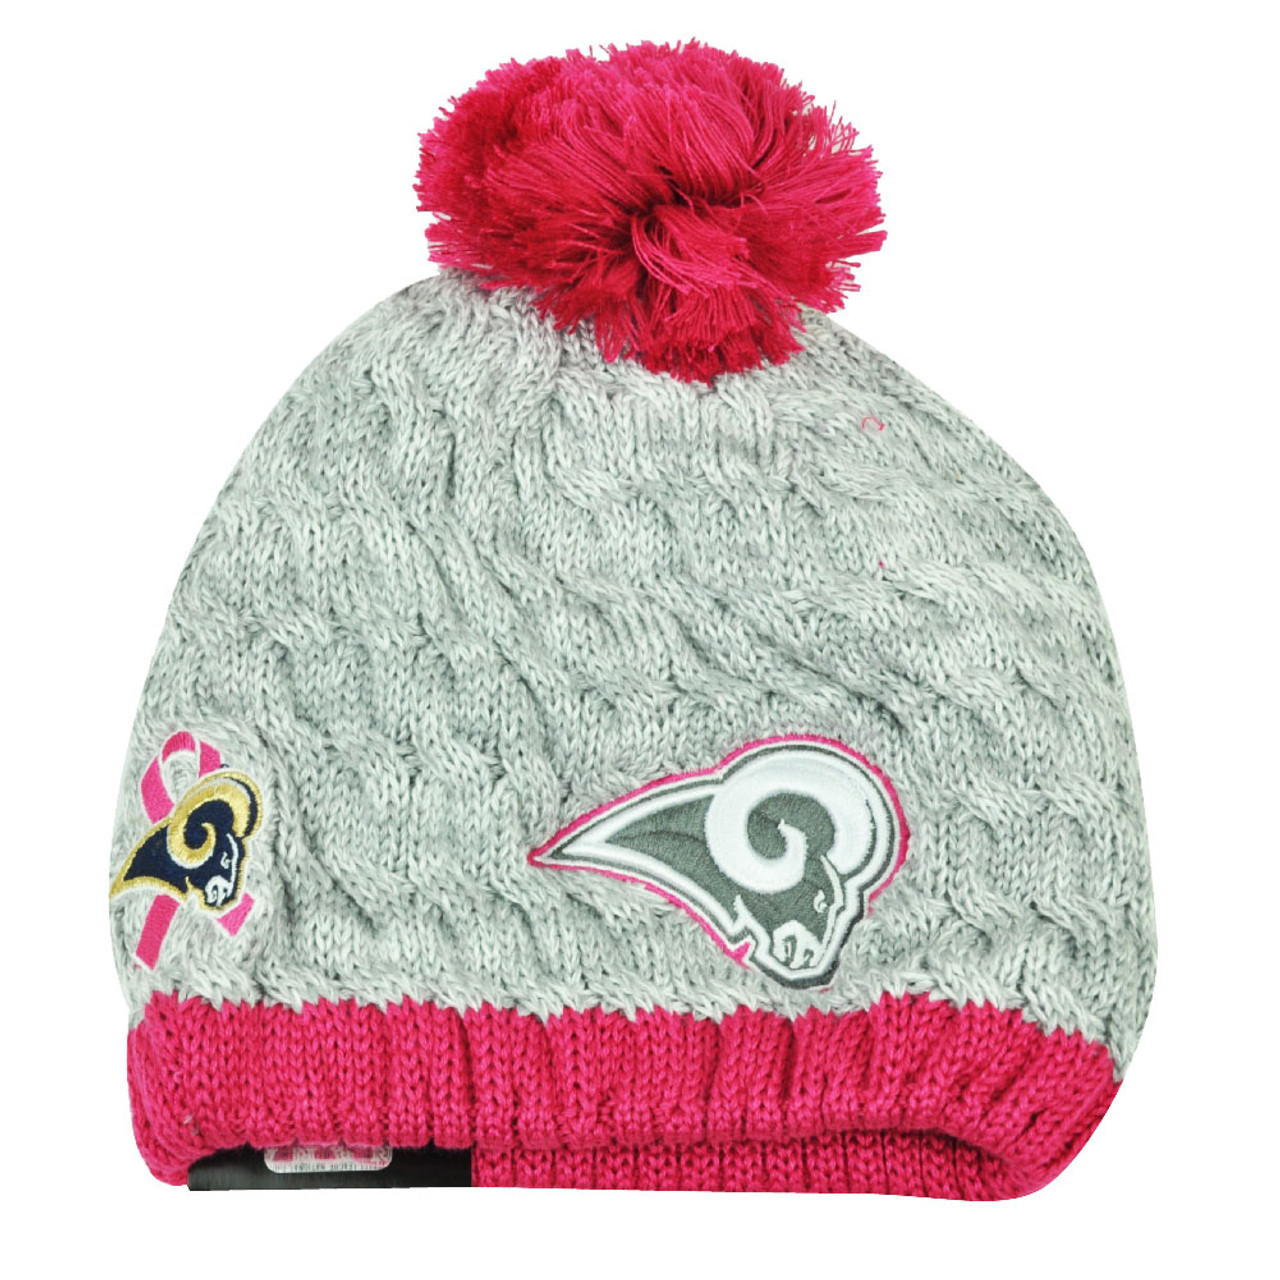 buy popular 921b3 4928e NFL New Era Breast Cancer Awareness Knit Beanie St Louis Rams Pink Womens  Hat - Cap Store Online.com